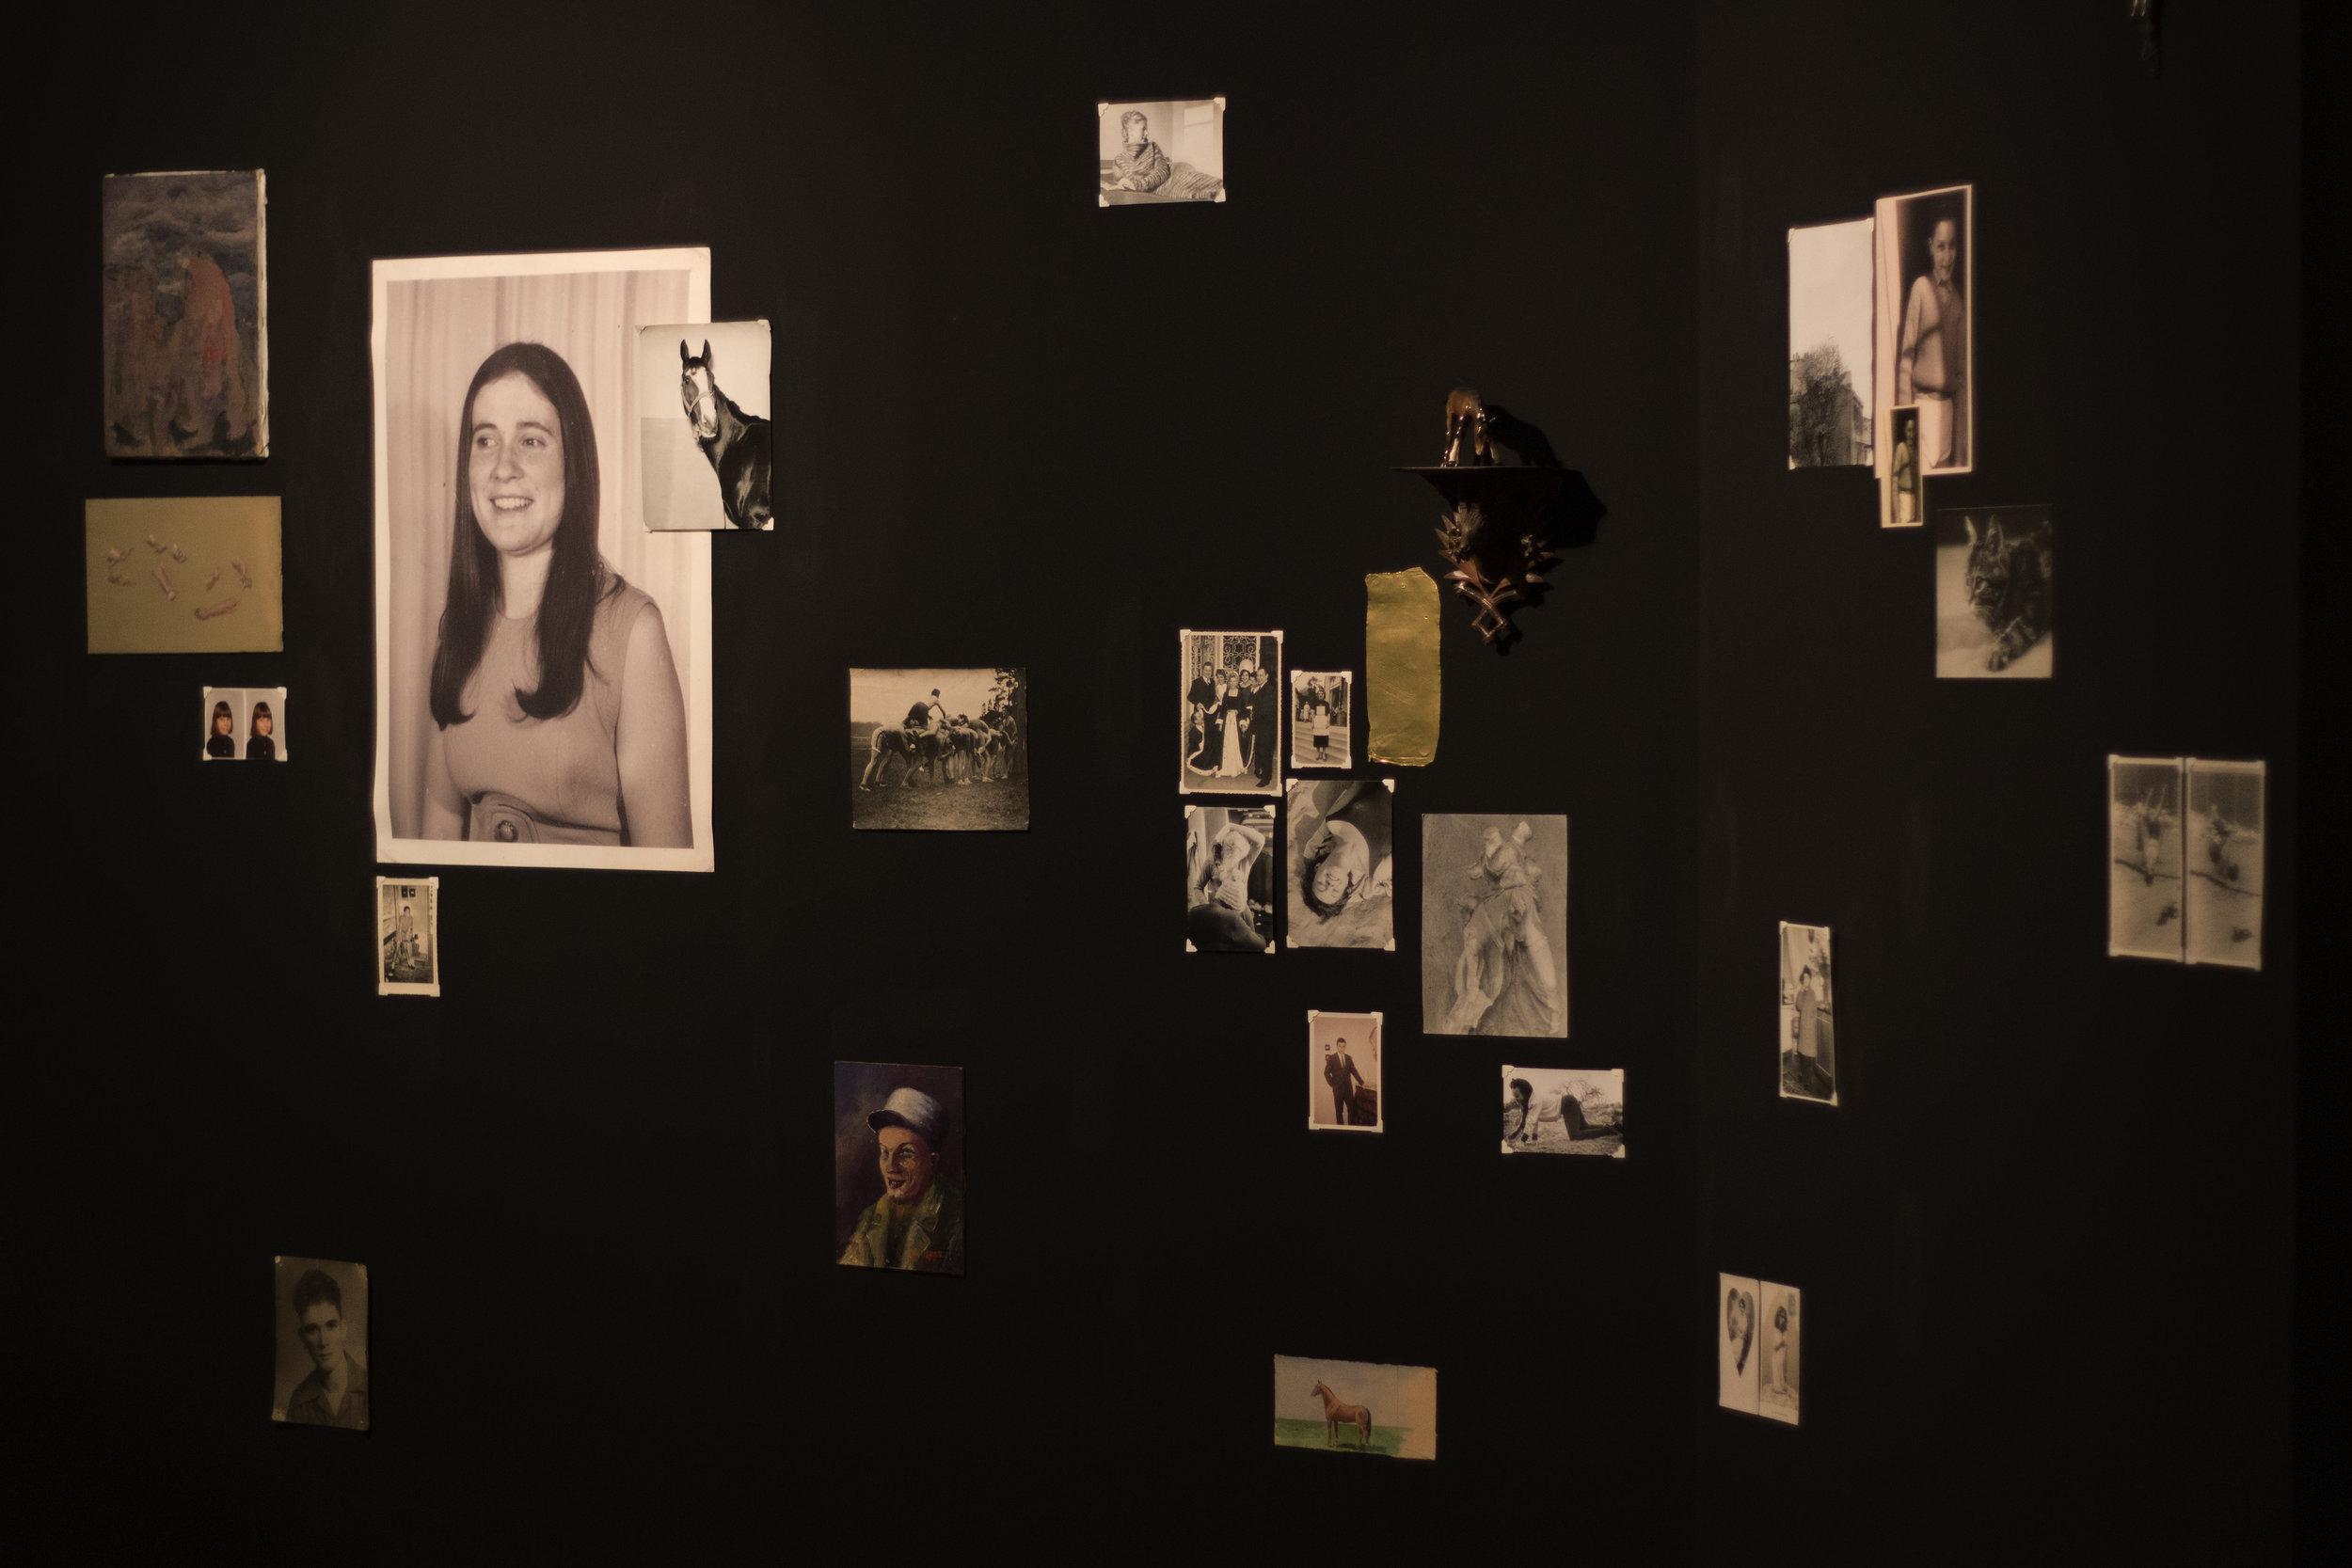 File 2132-97 Svetoslav S. Installation View, Alianza Francesa, Costa Rica. Images by Verónica Alfaro. 2017